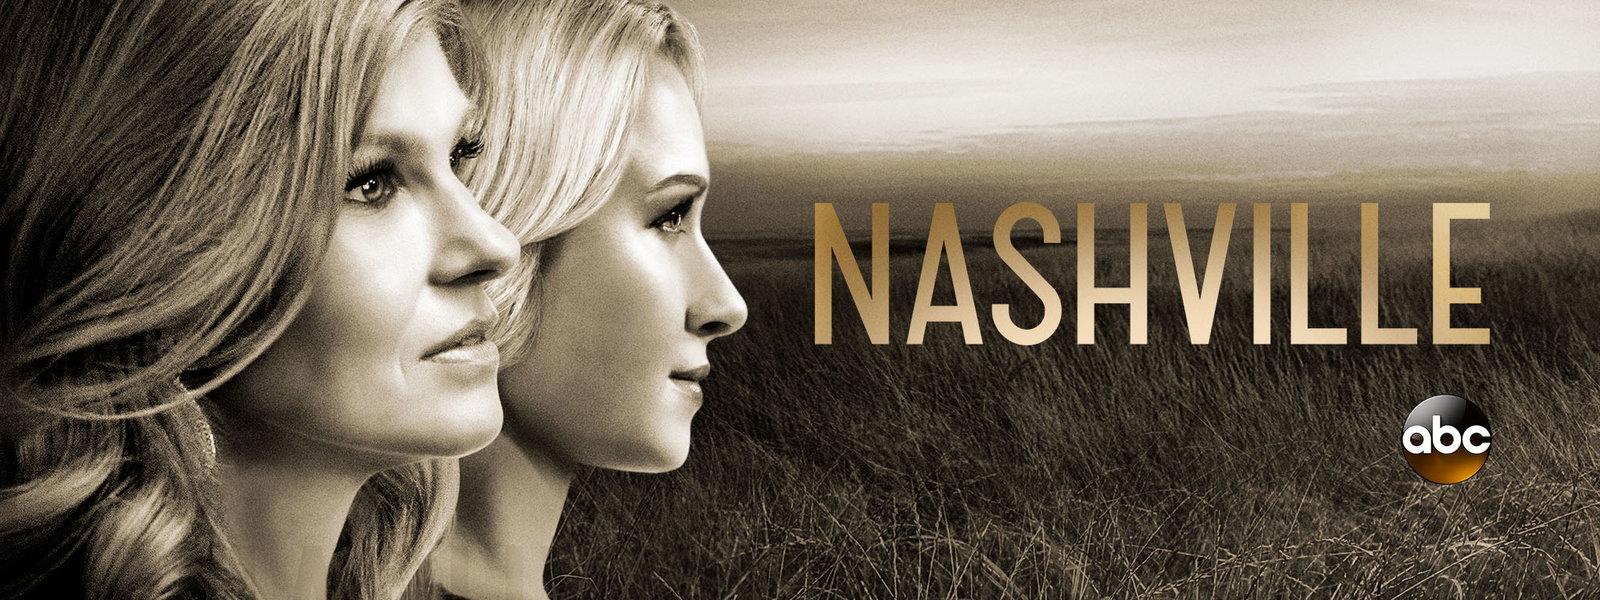 Nashville S04 720p 1080p WEB DL | S04E01-E08 GHvwwo